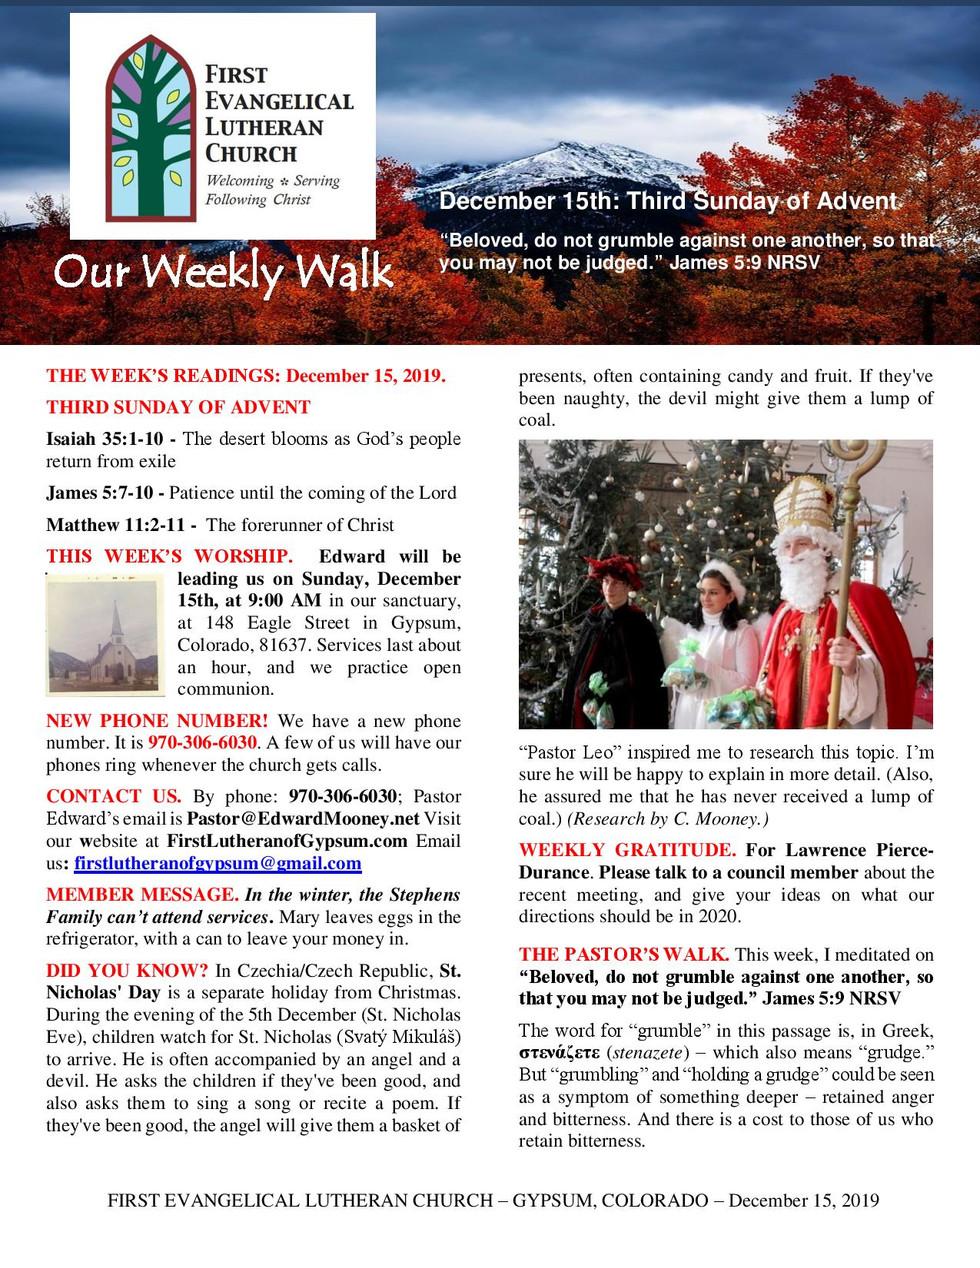 Newsletter, December 15, 2019, page 1